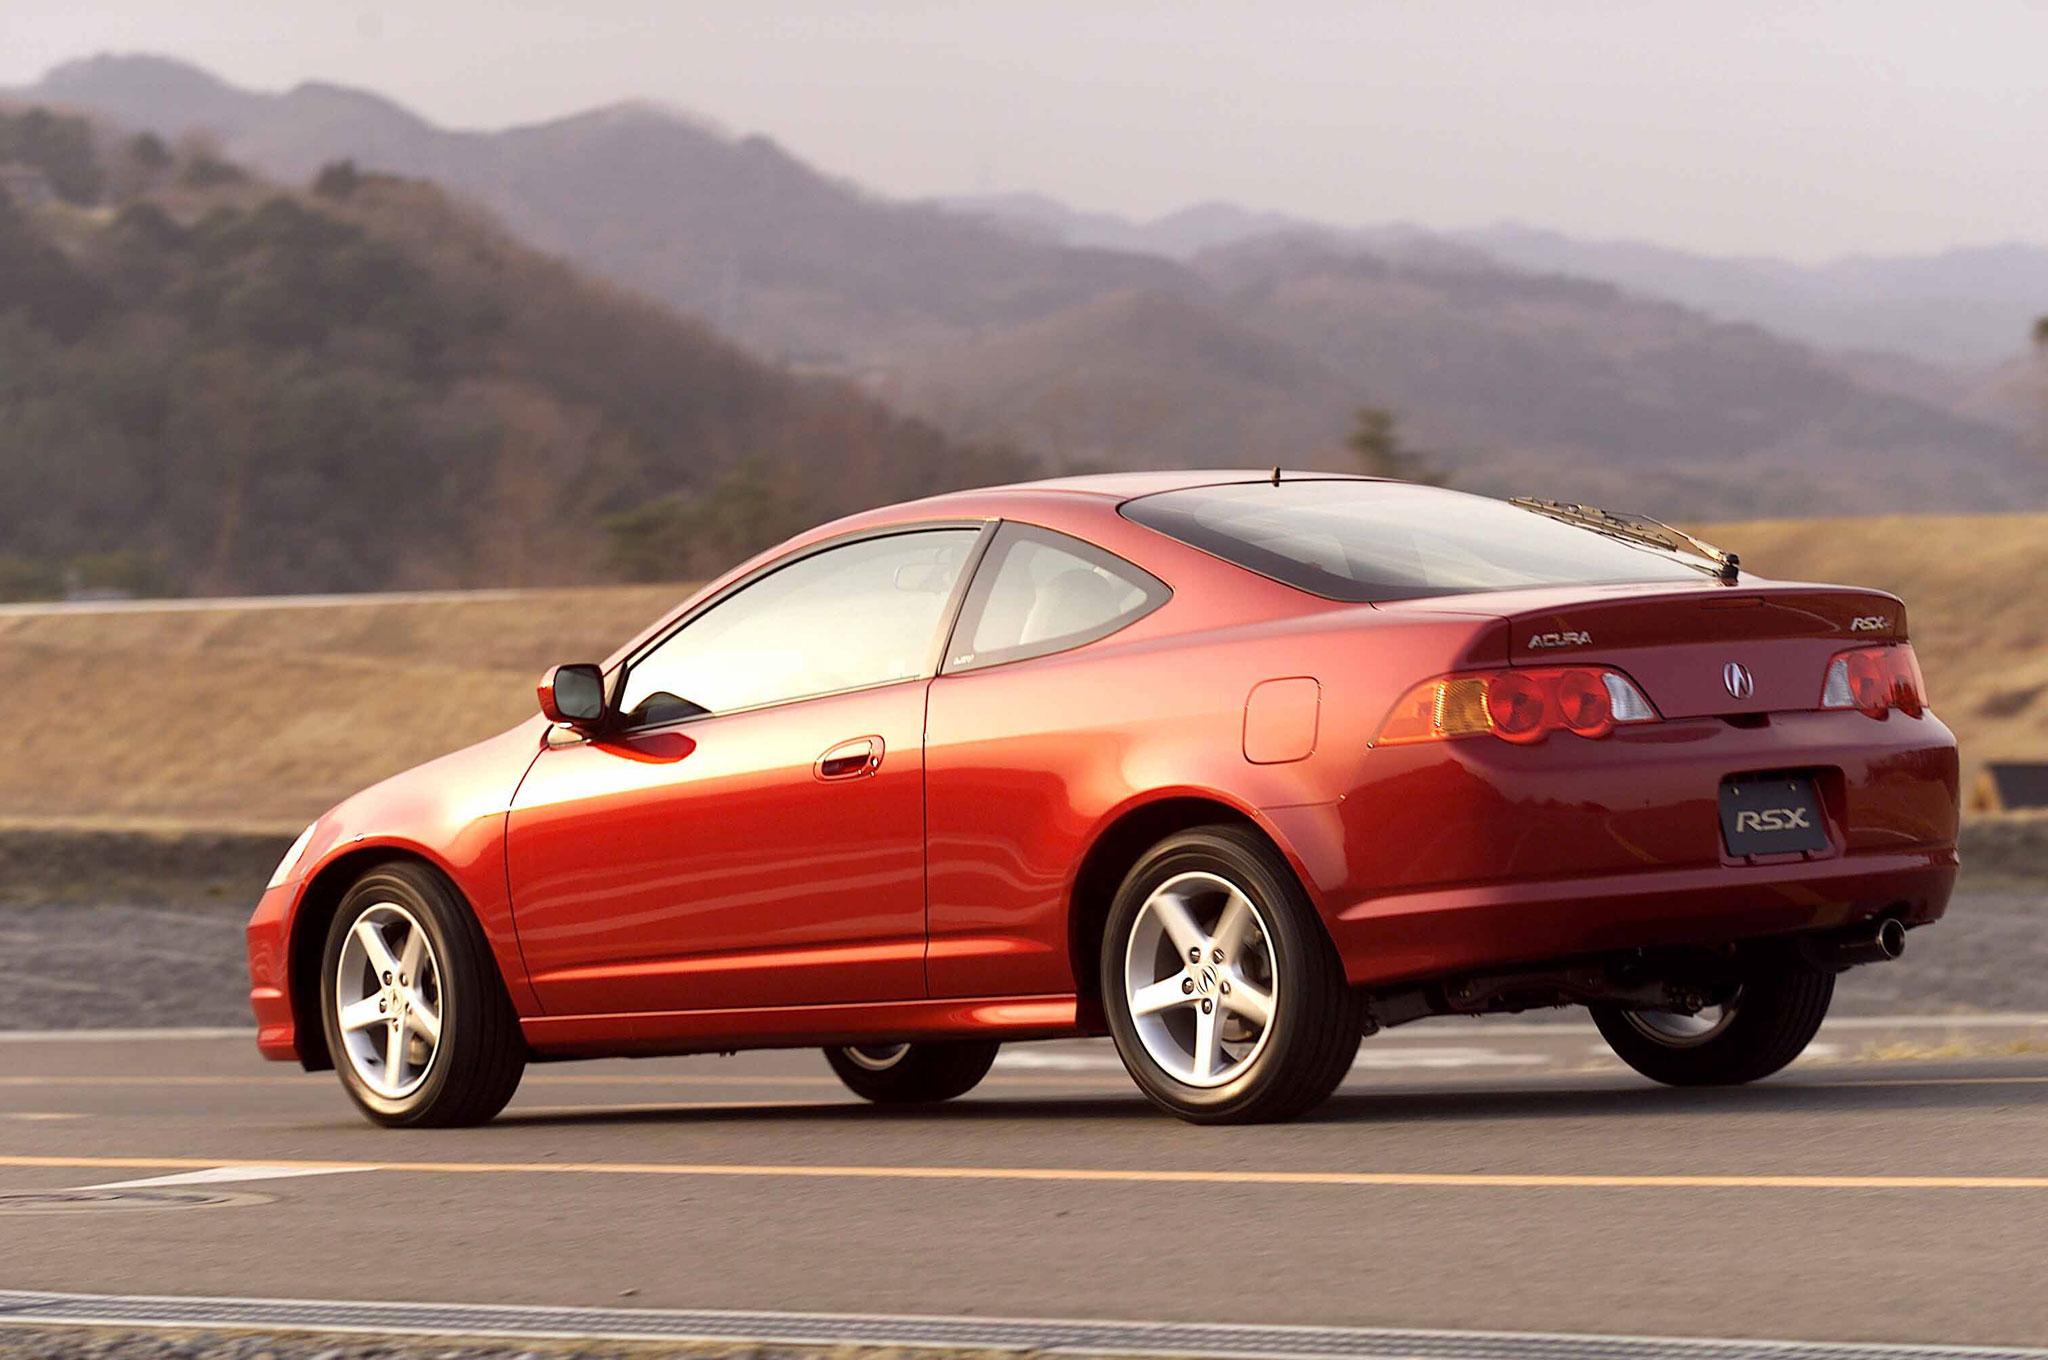 2002 Acura RSX Type-S - Four Seasons Wrap-Up